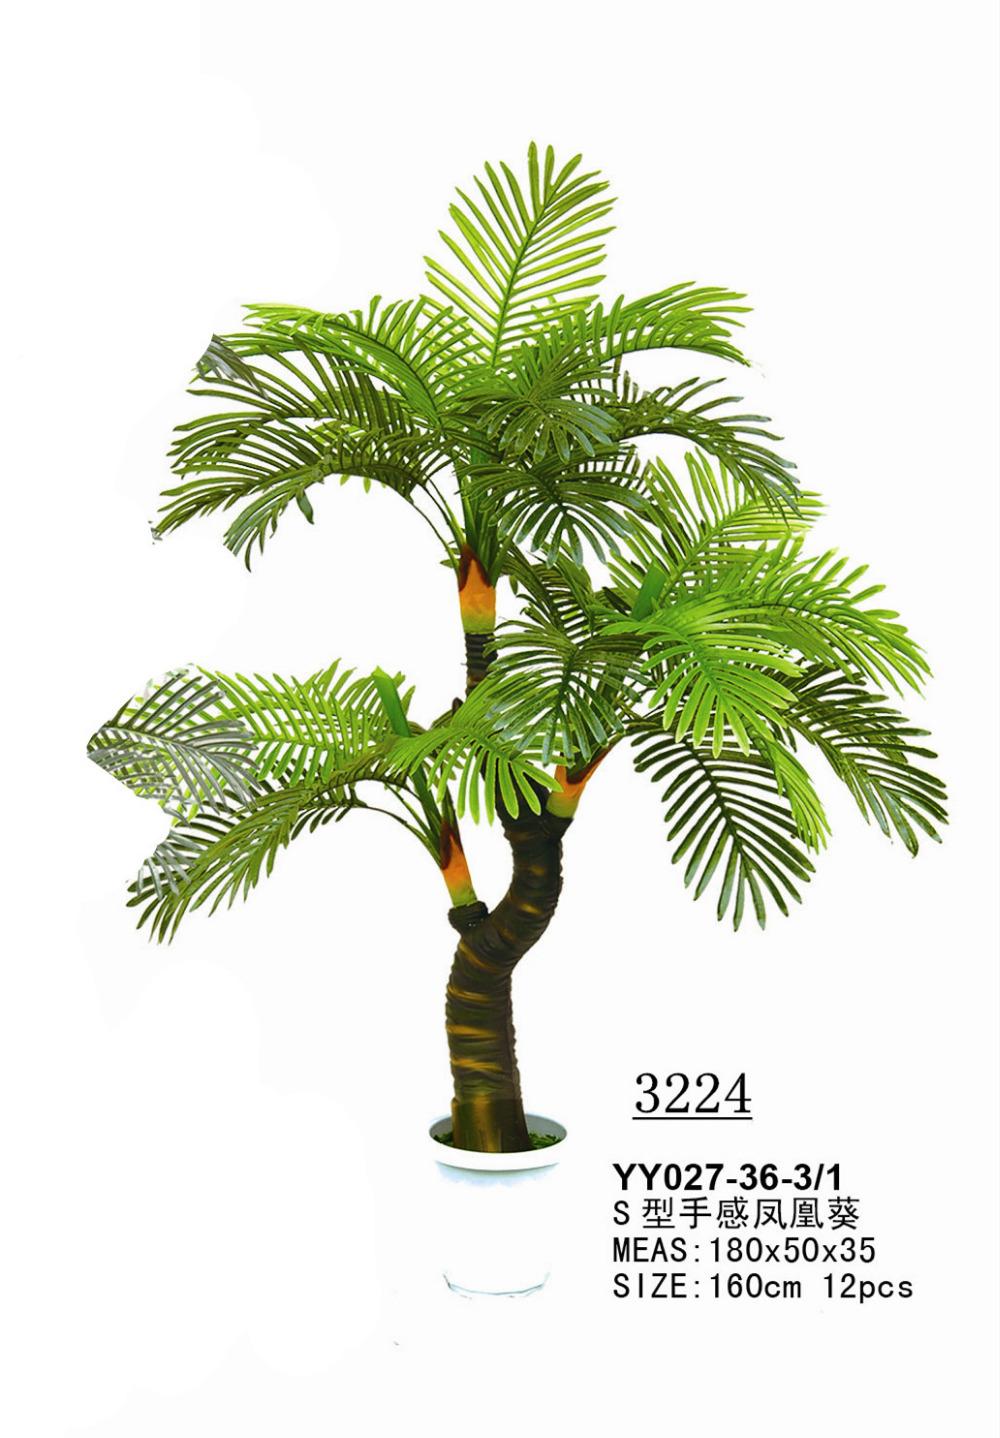 Wholesale Artificial Indoor Palm Tree Chrysalidocarpus Lutescens ...